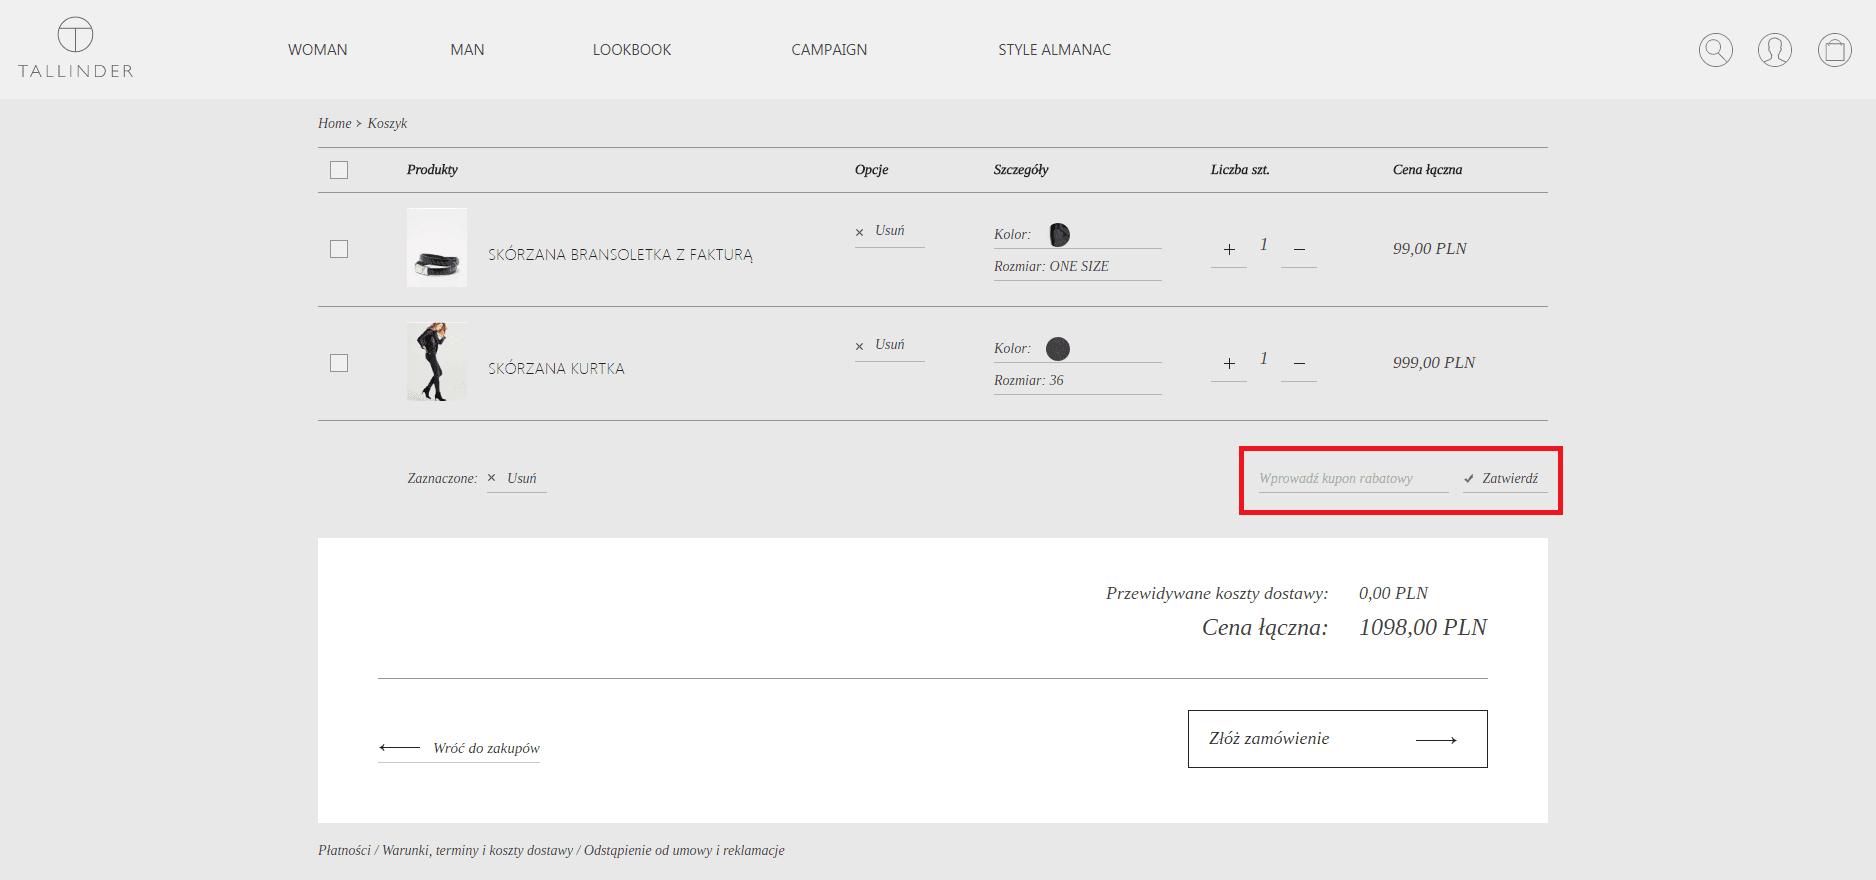 Tallinder kod rabatowy kod rabatowy Kupon pl